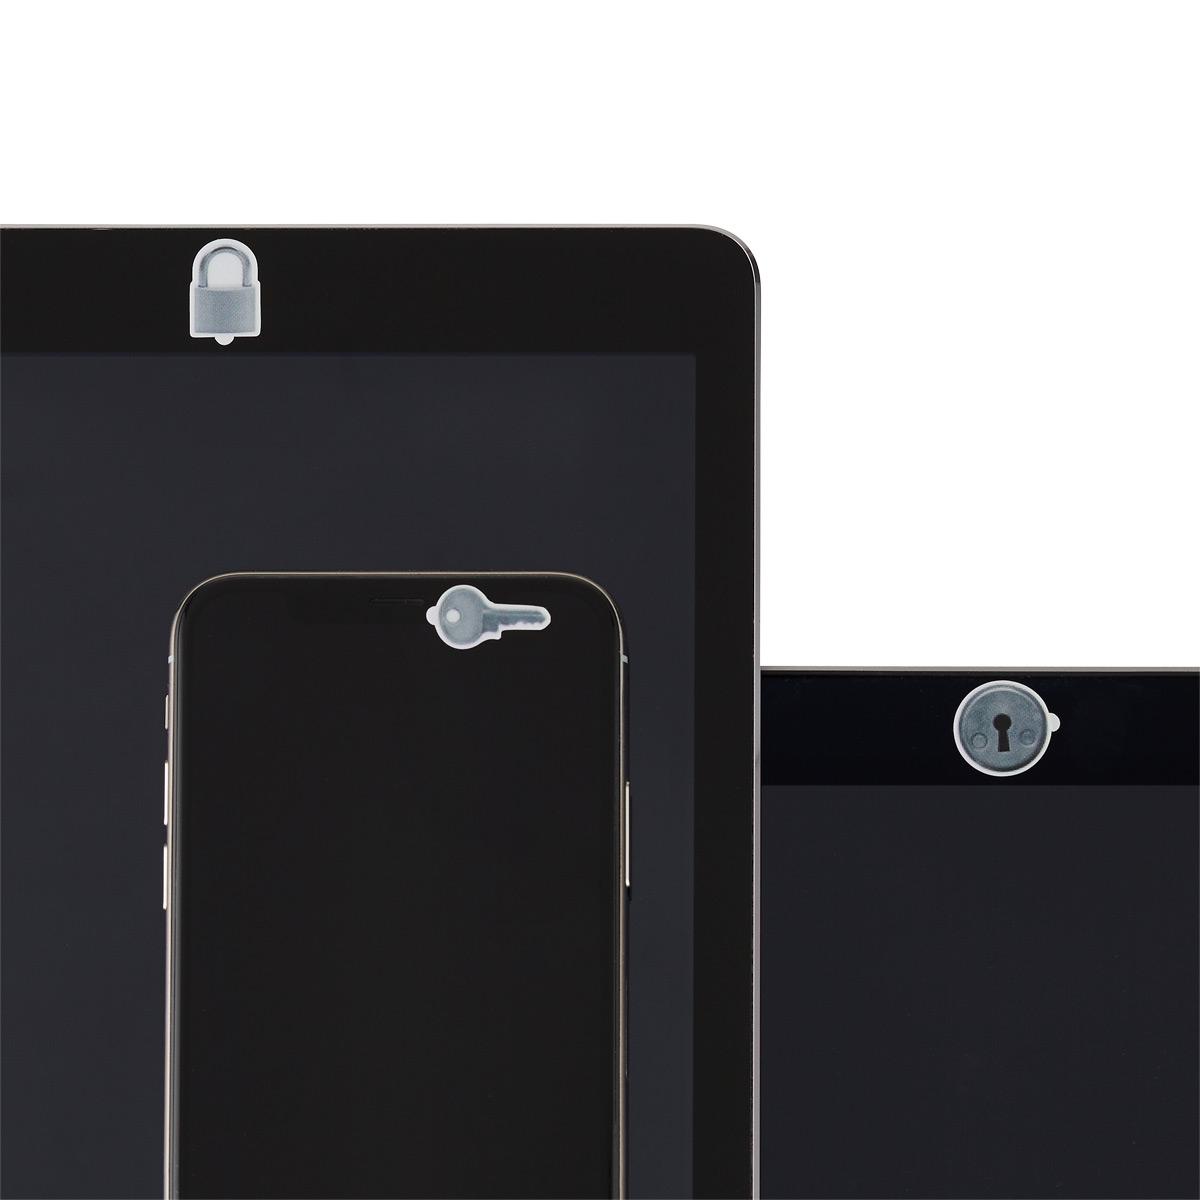 SpyBlocker Grey Webcam Covers